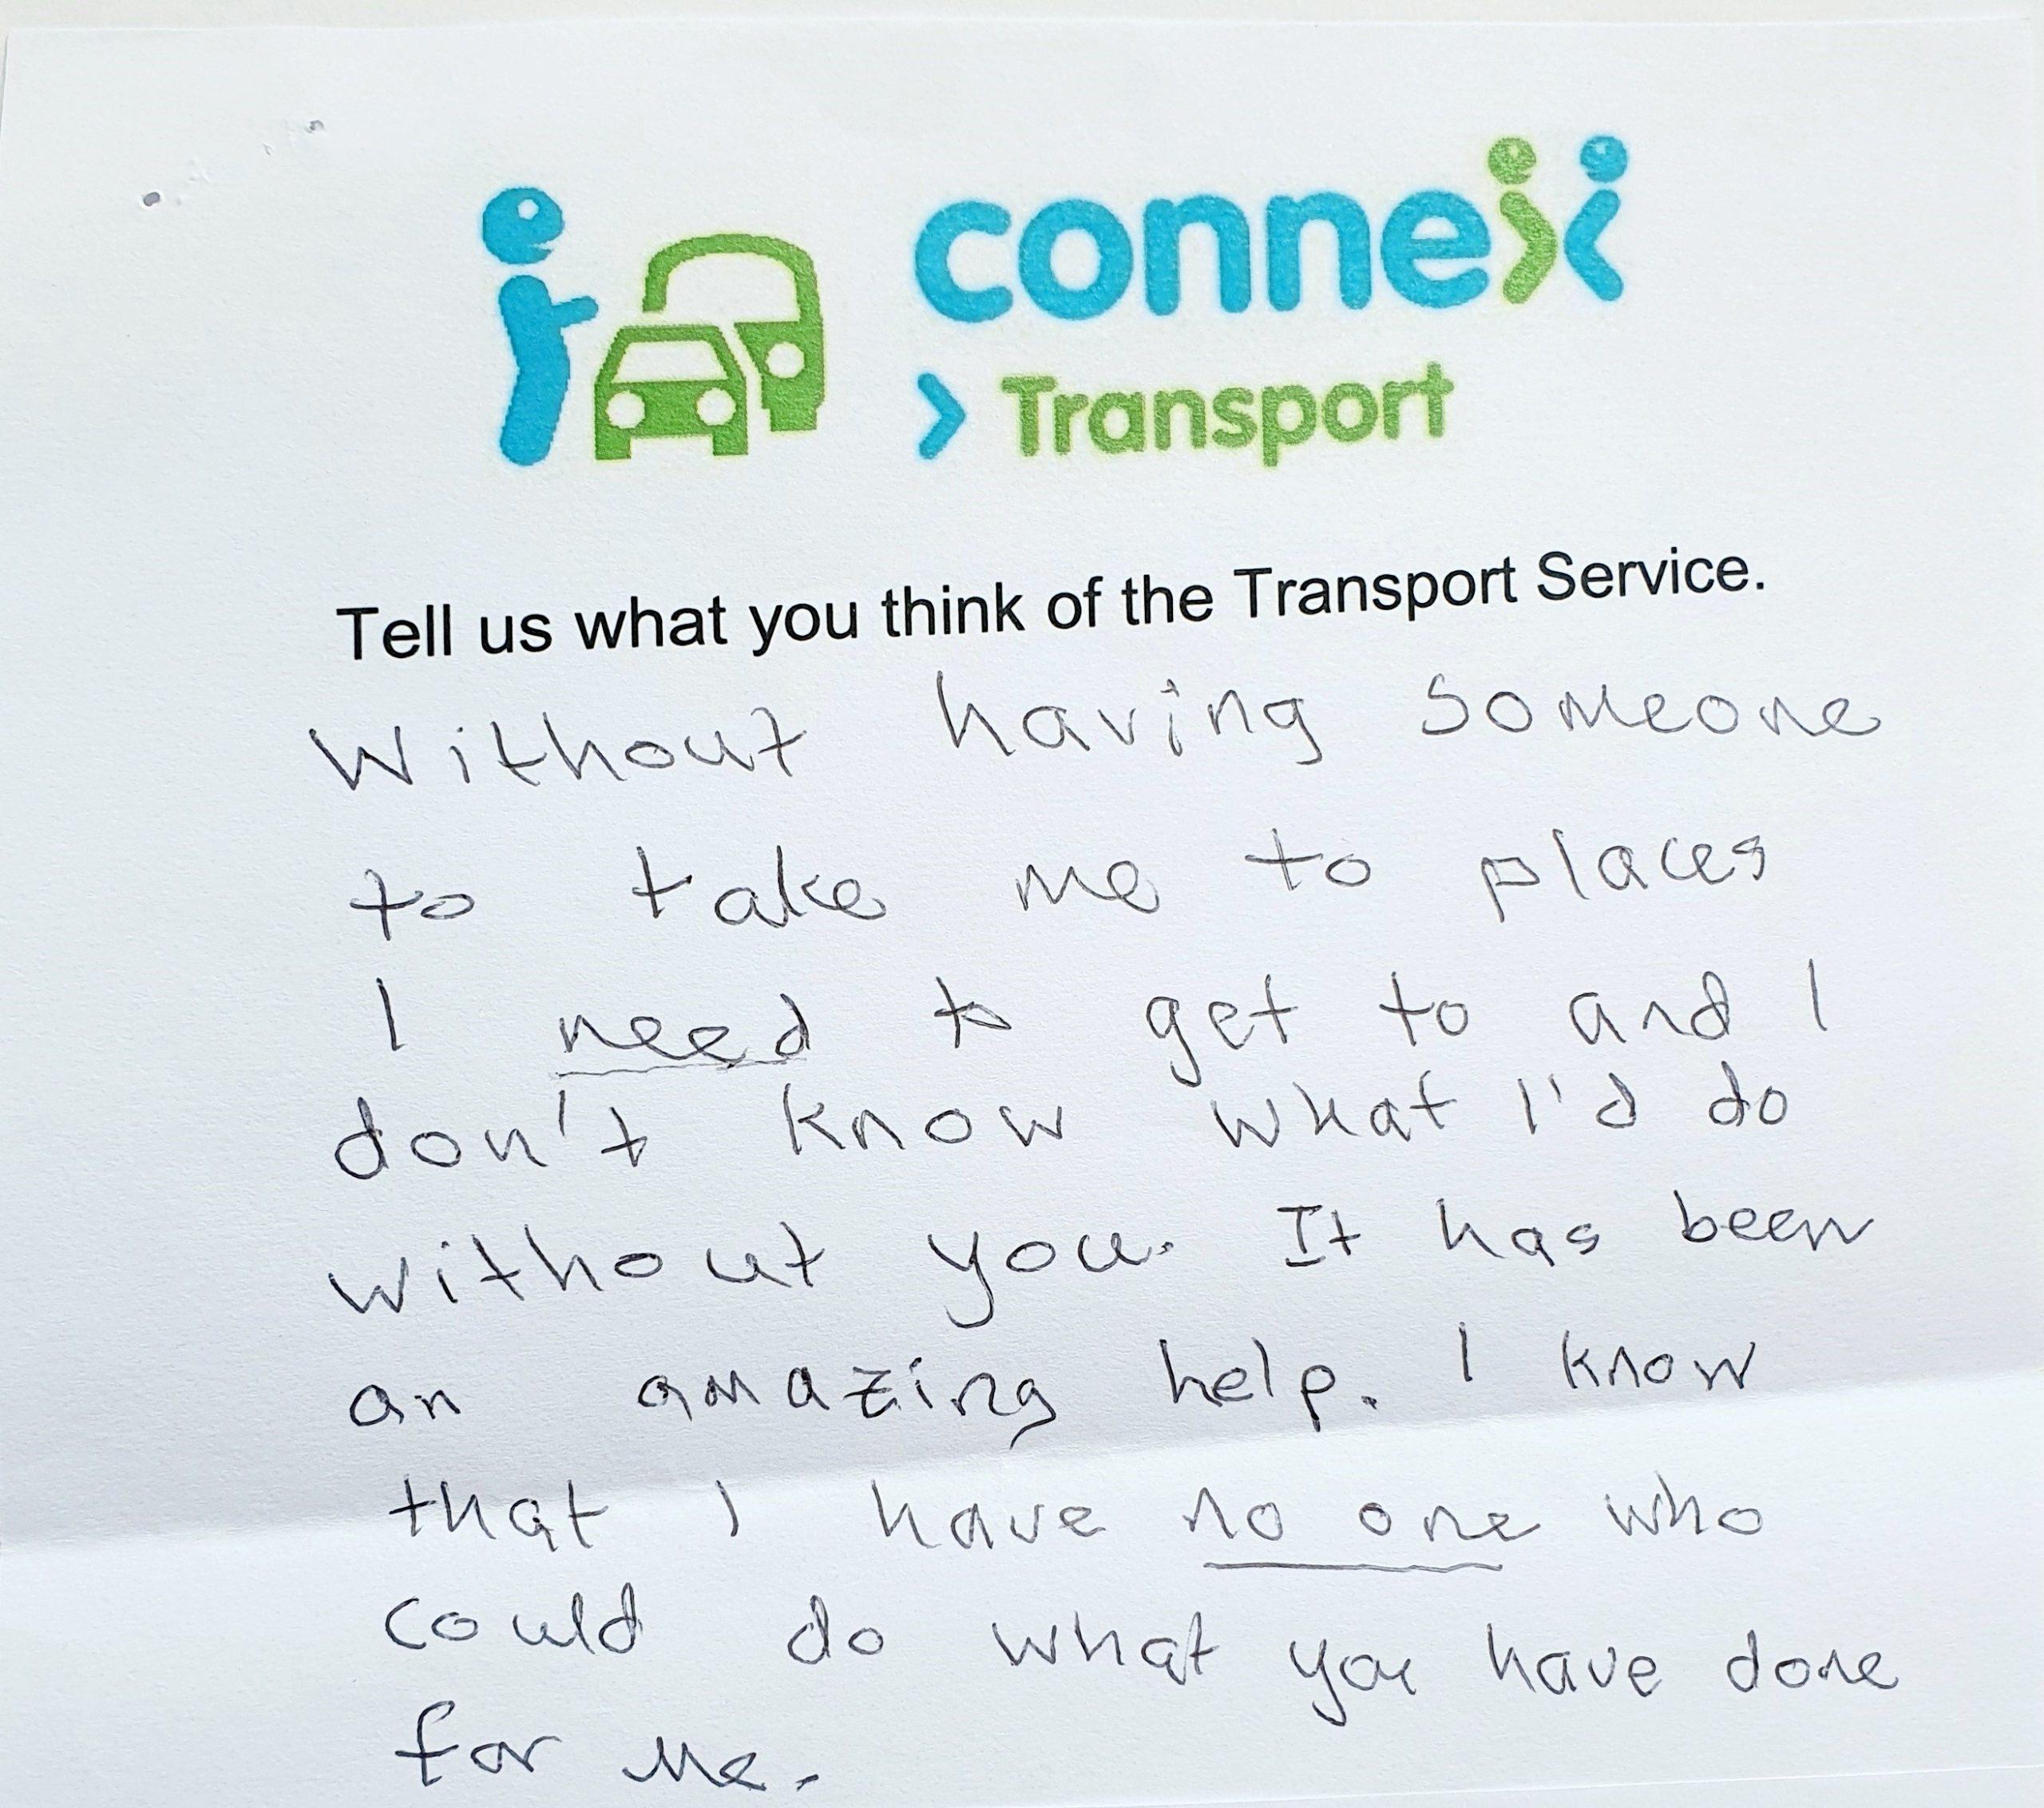 Letter from grateful transport client